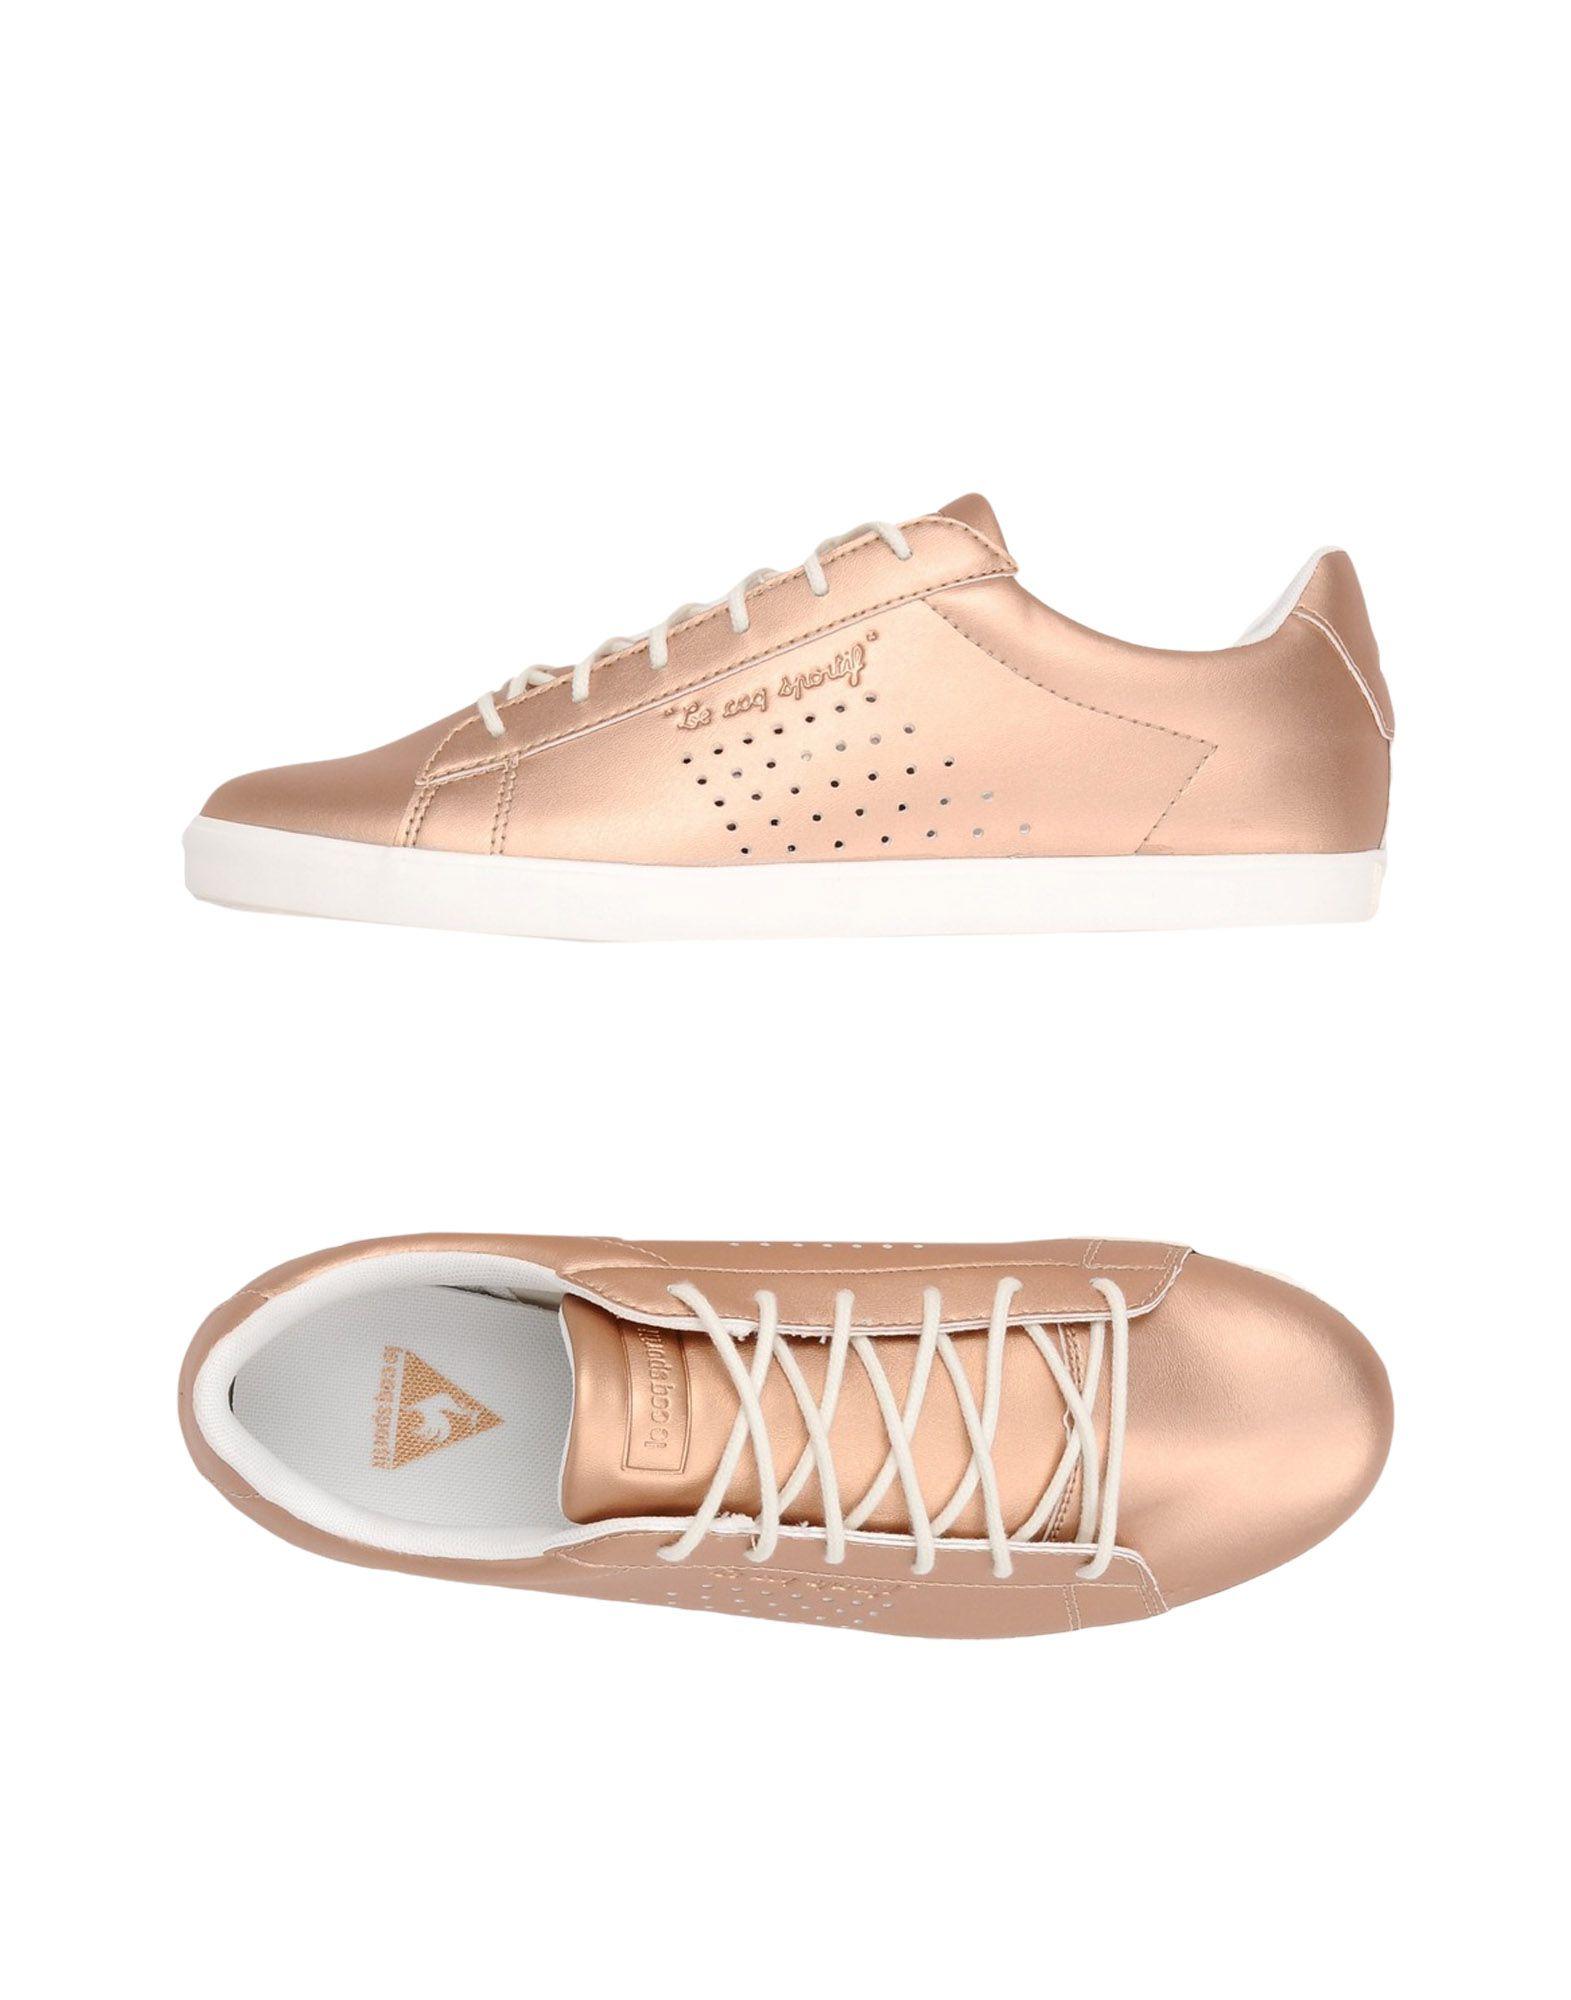 Le Coq Sportif Agate Lo Pearlized  11368895RD Gute Qualität beliebte Schuhe